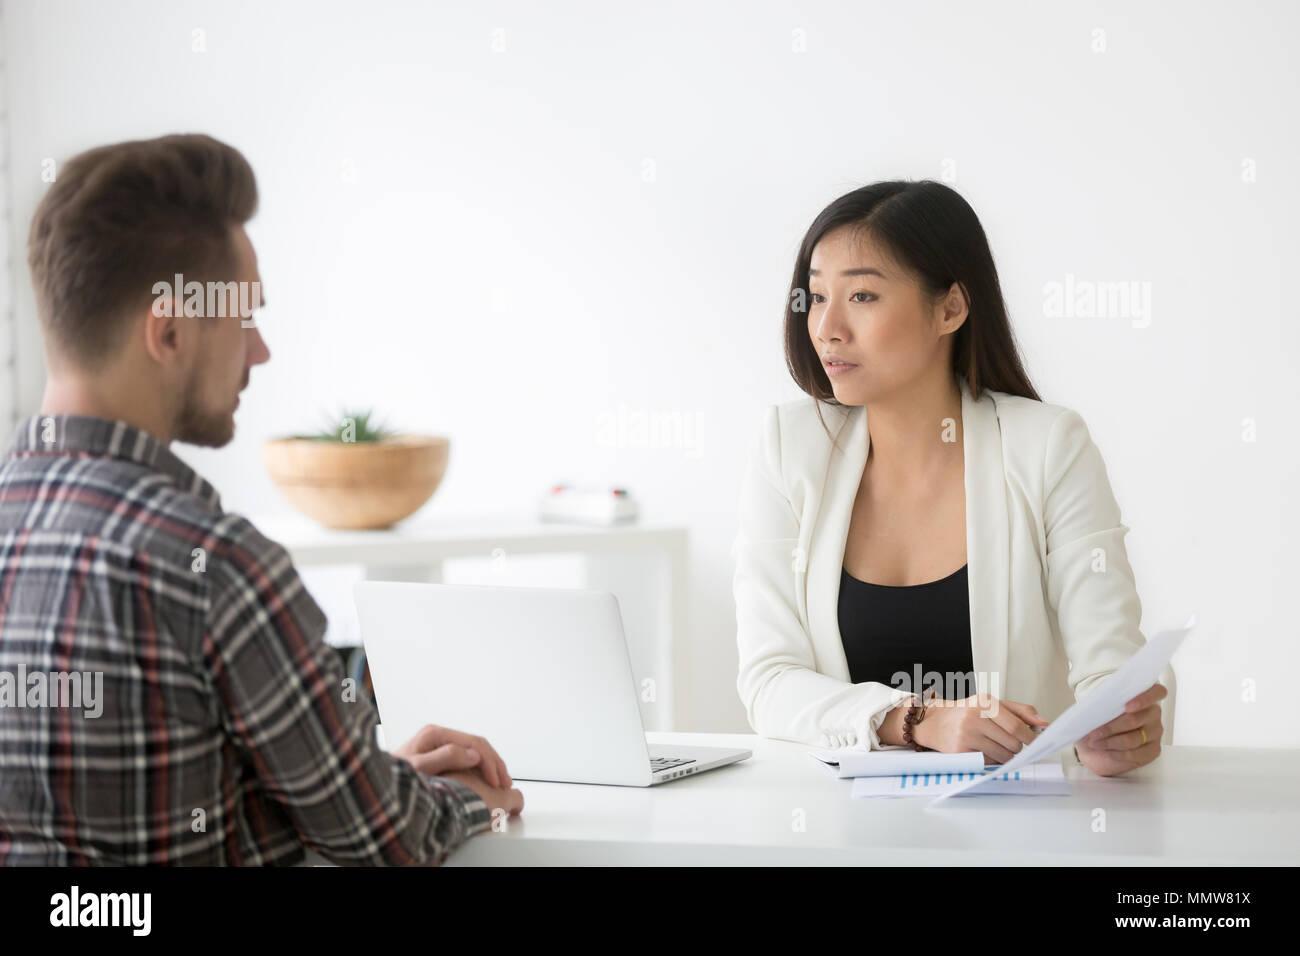 Distrustful serious asian businesswoman discussing business docu - Stock Image